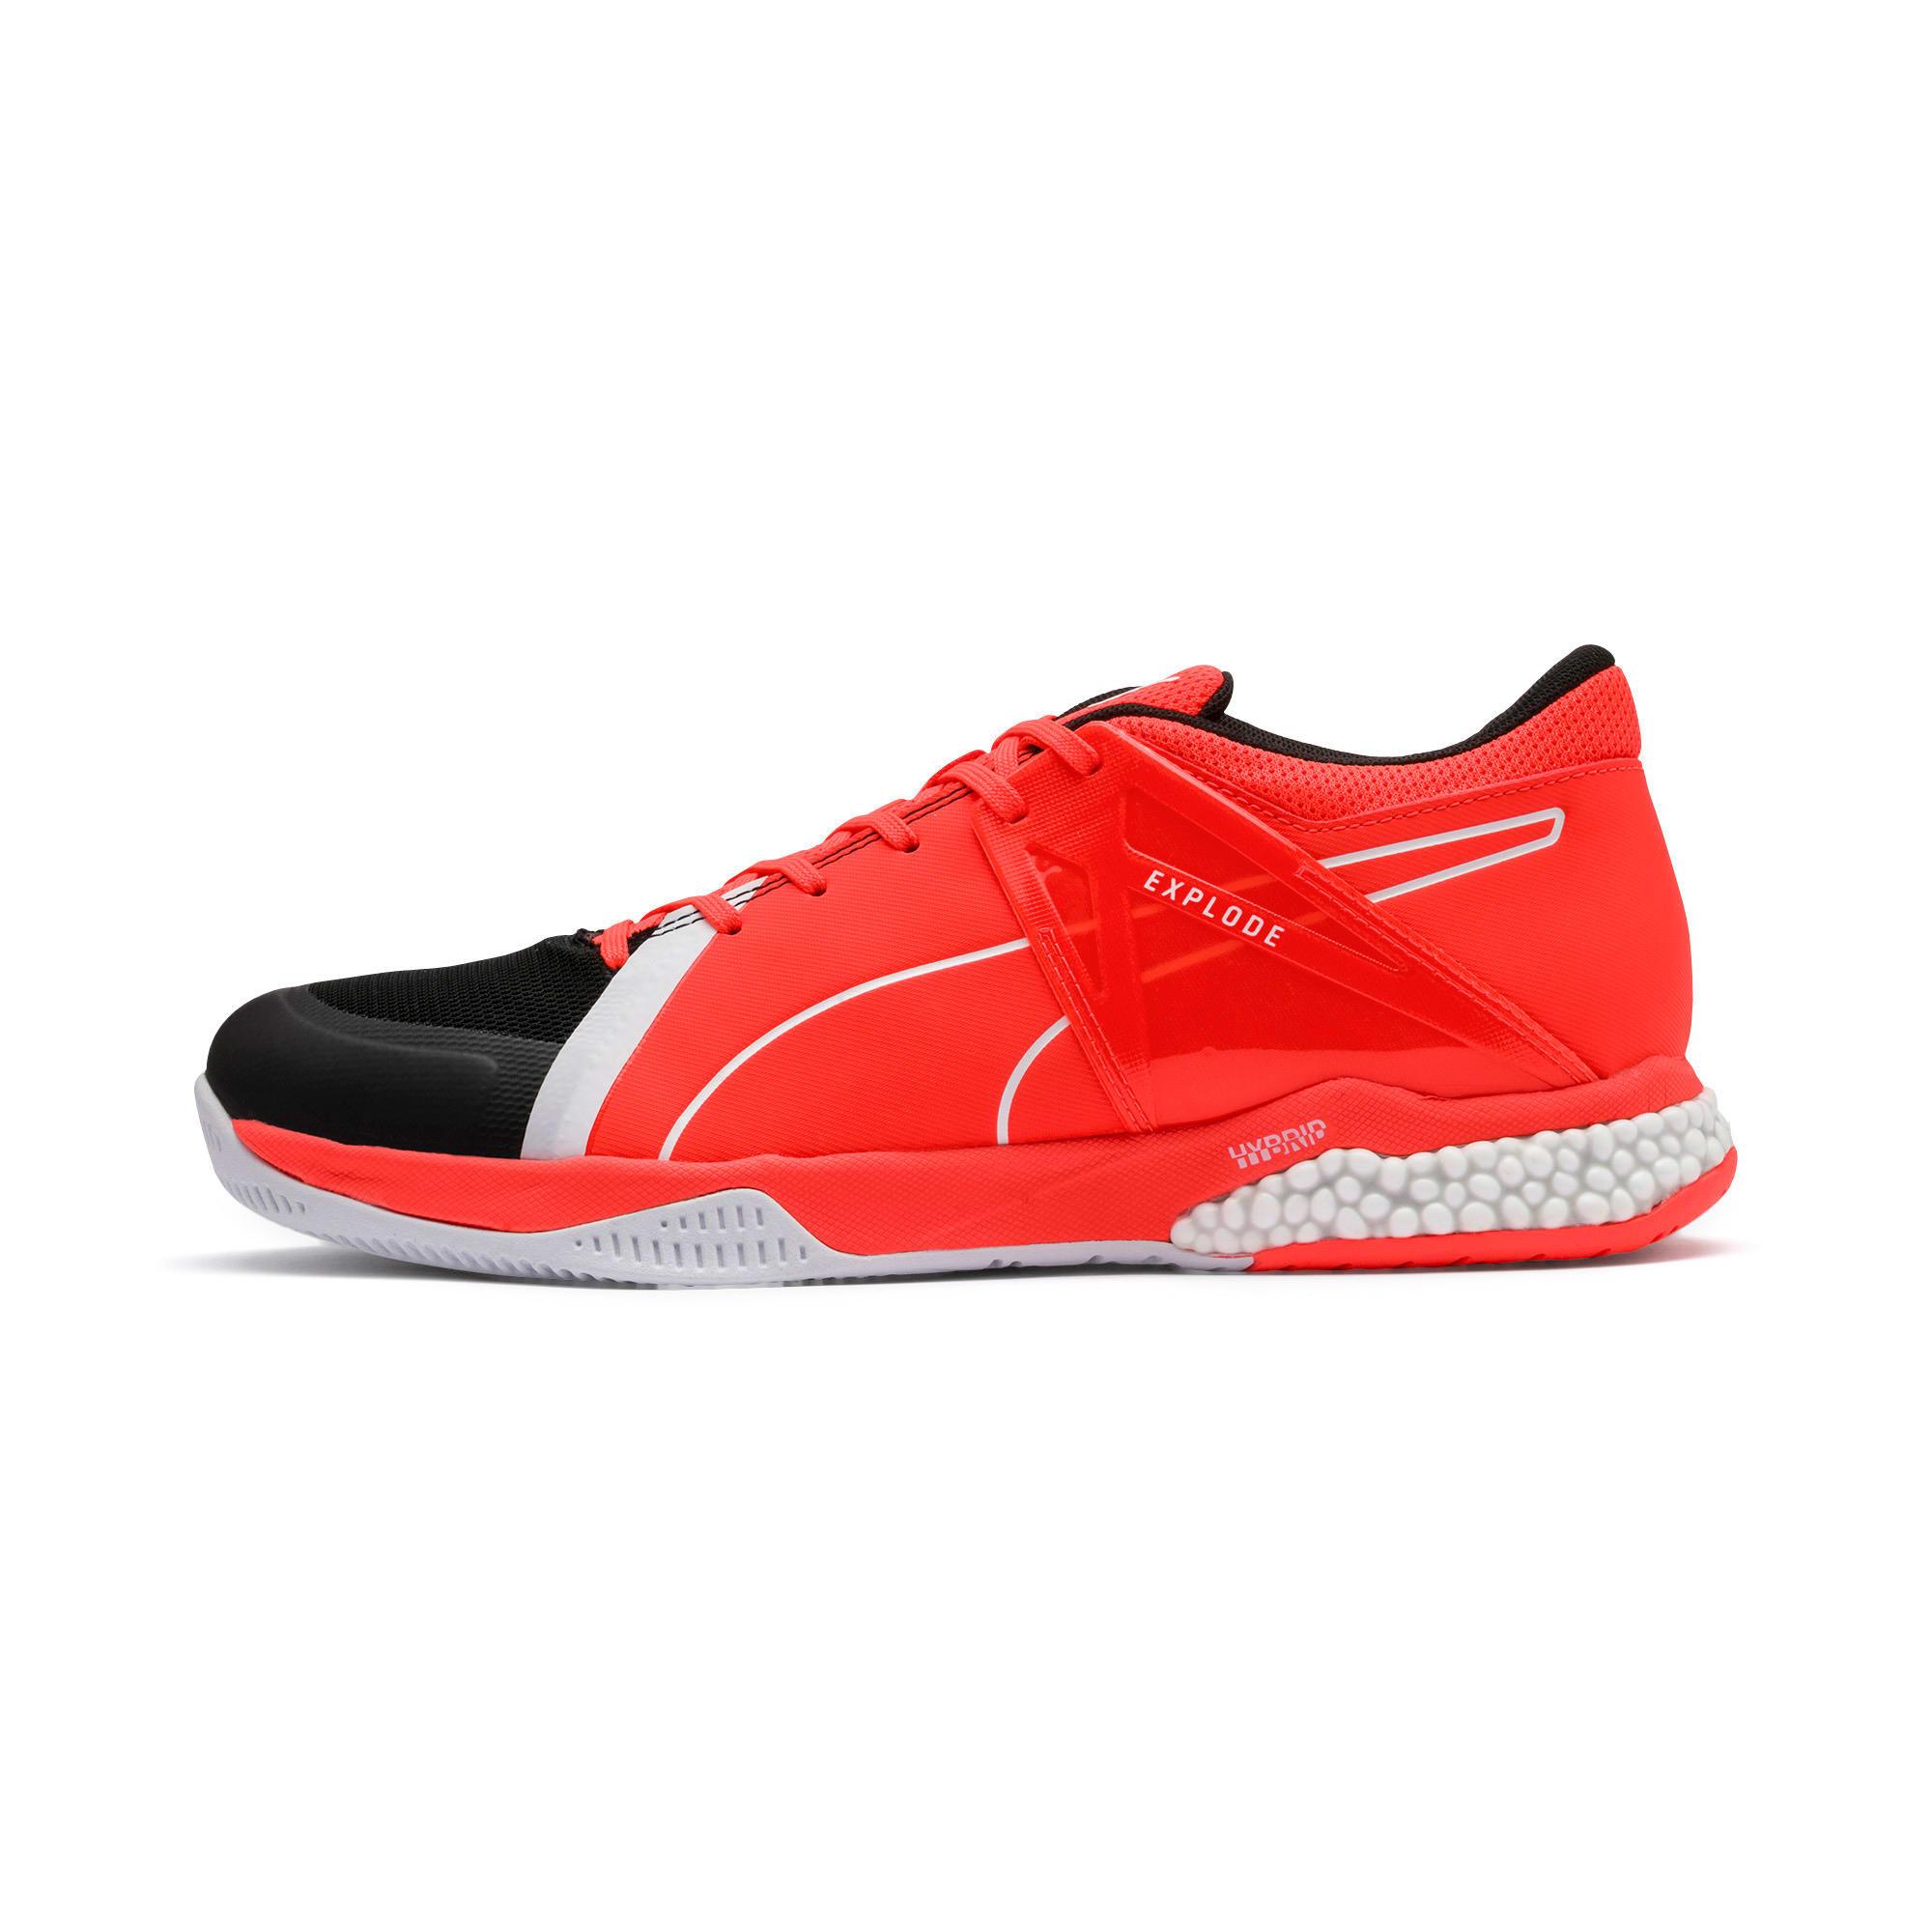 Thumbnail 1 of Chaussures Handball Explode XT Hybrid 2 Training, Black-Puma White-Nrgy Red, medium